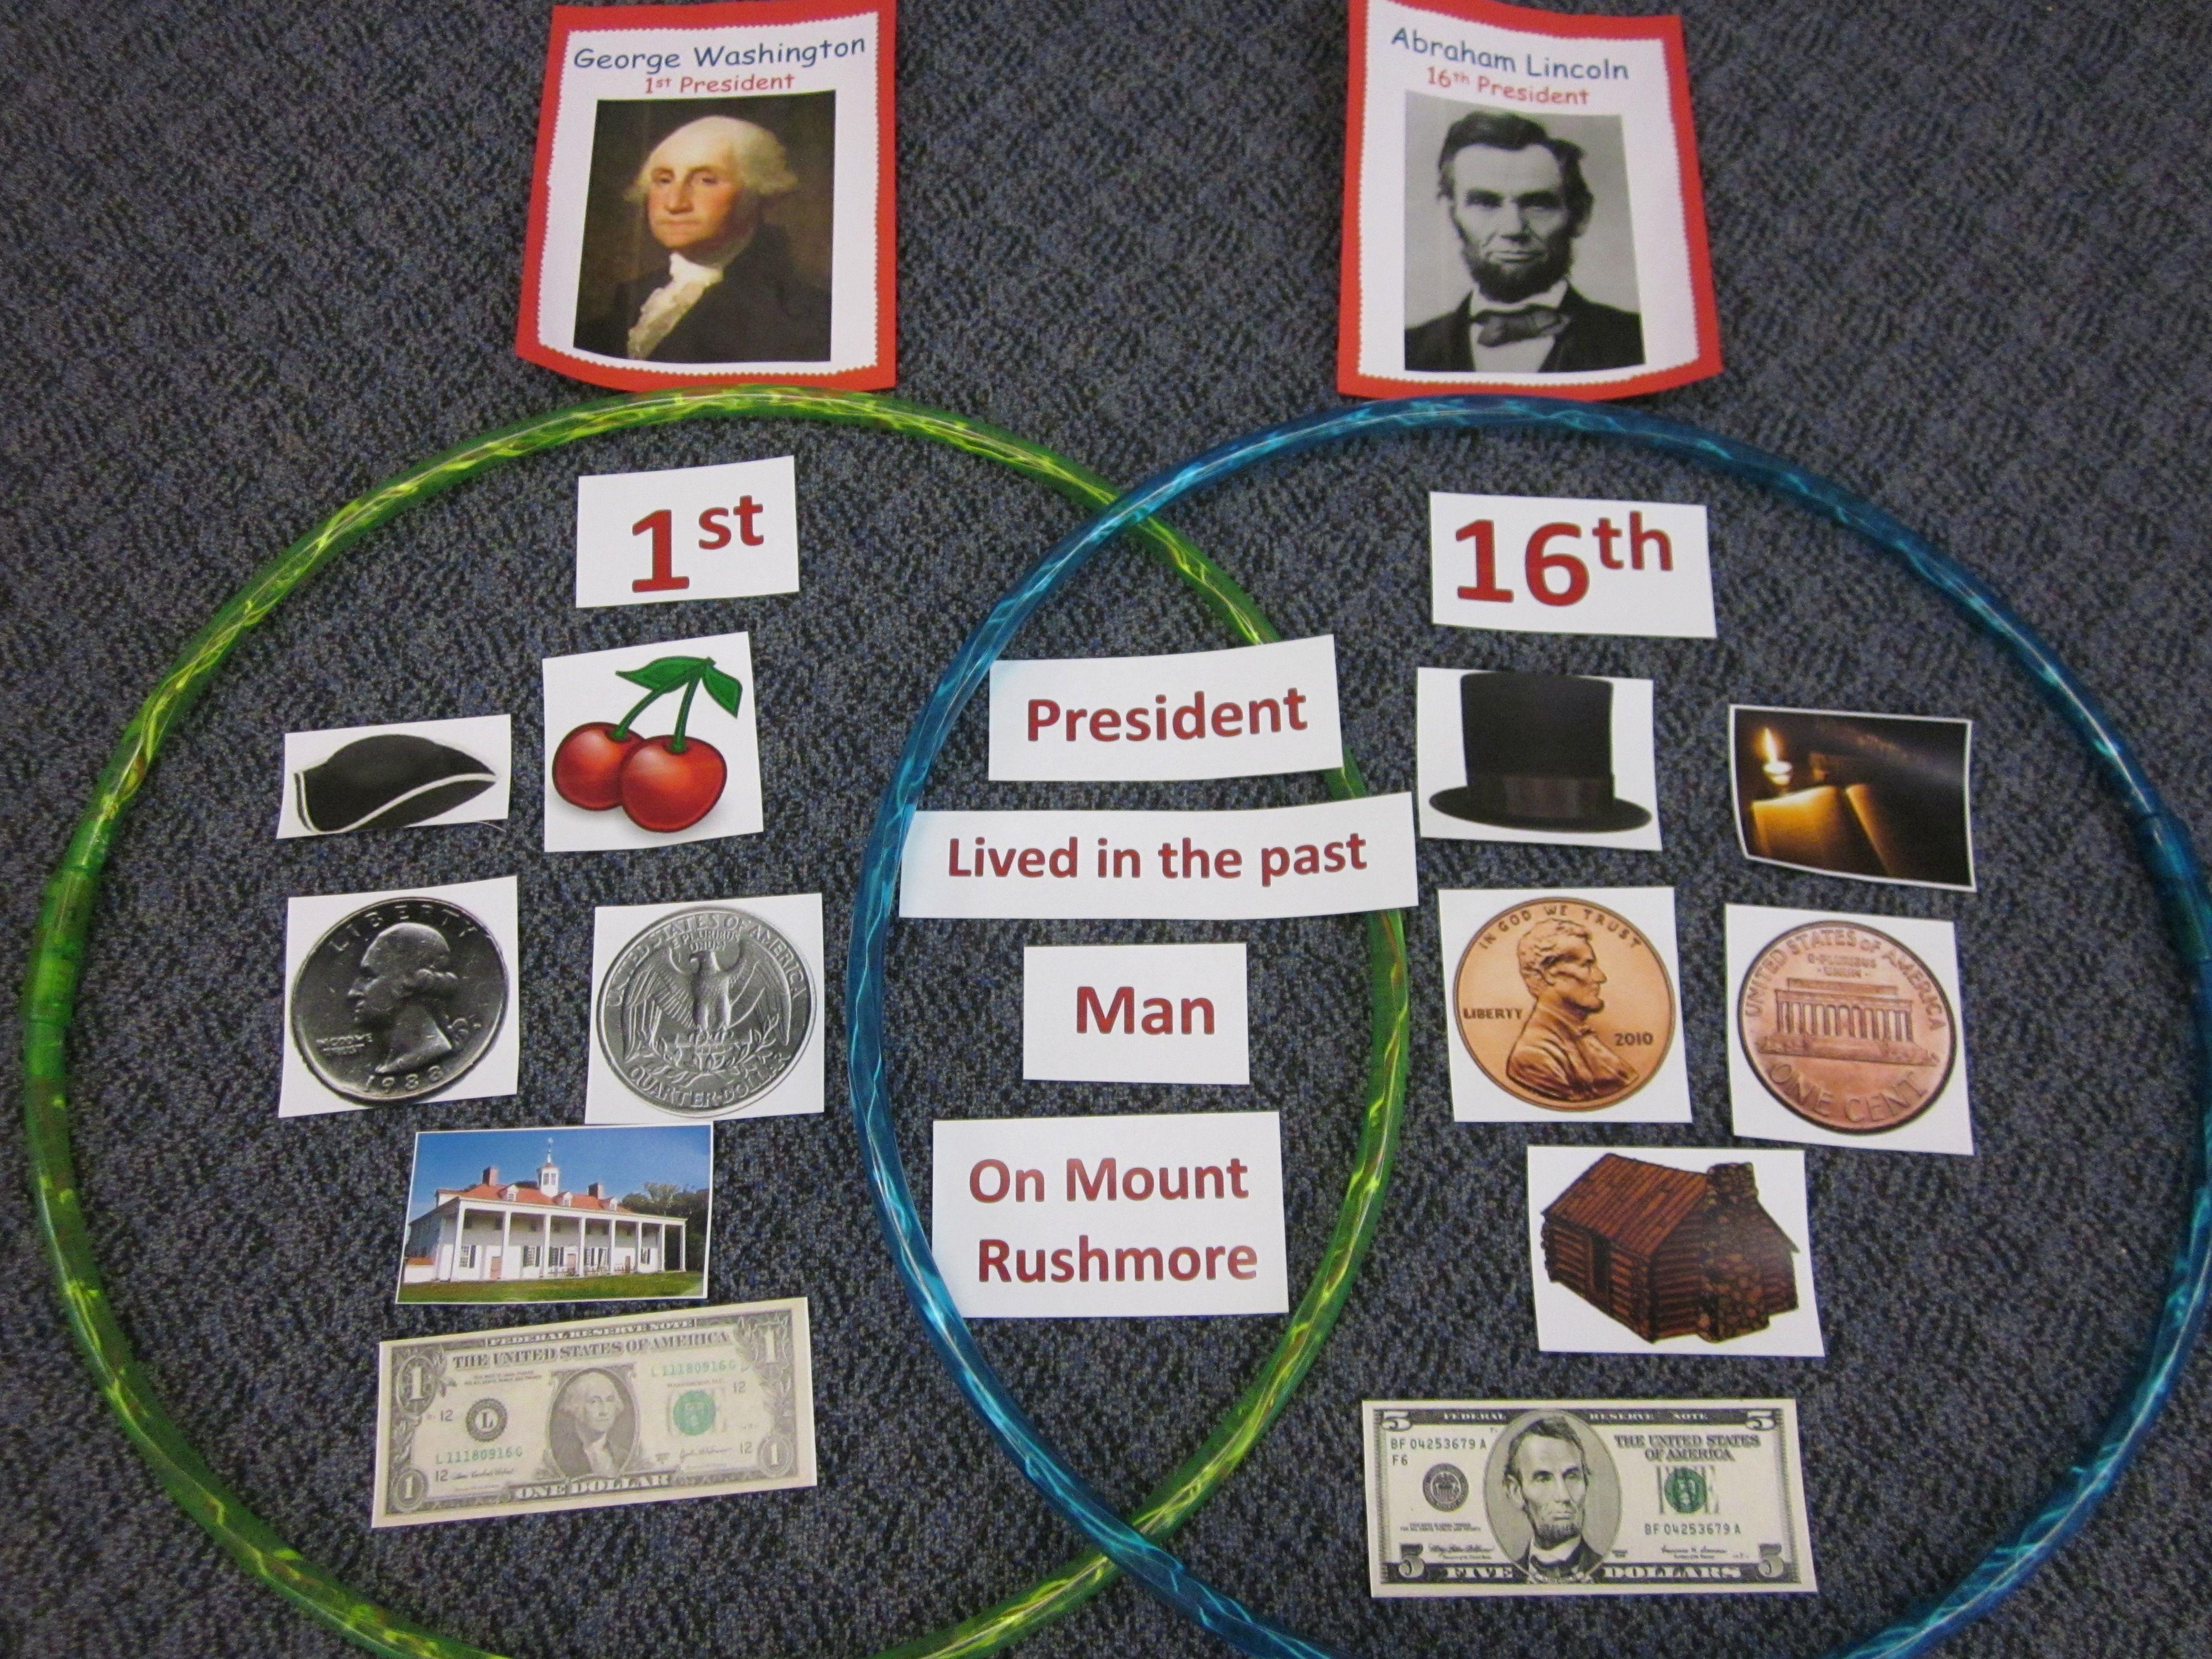 Venn Diagram With Hula Hoops Paring George Washington And Abraham Lincoln E Kids Loved